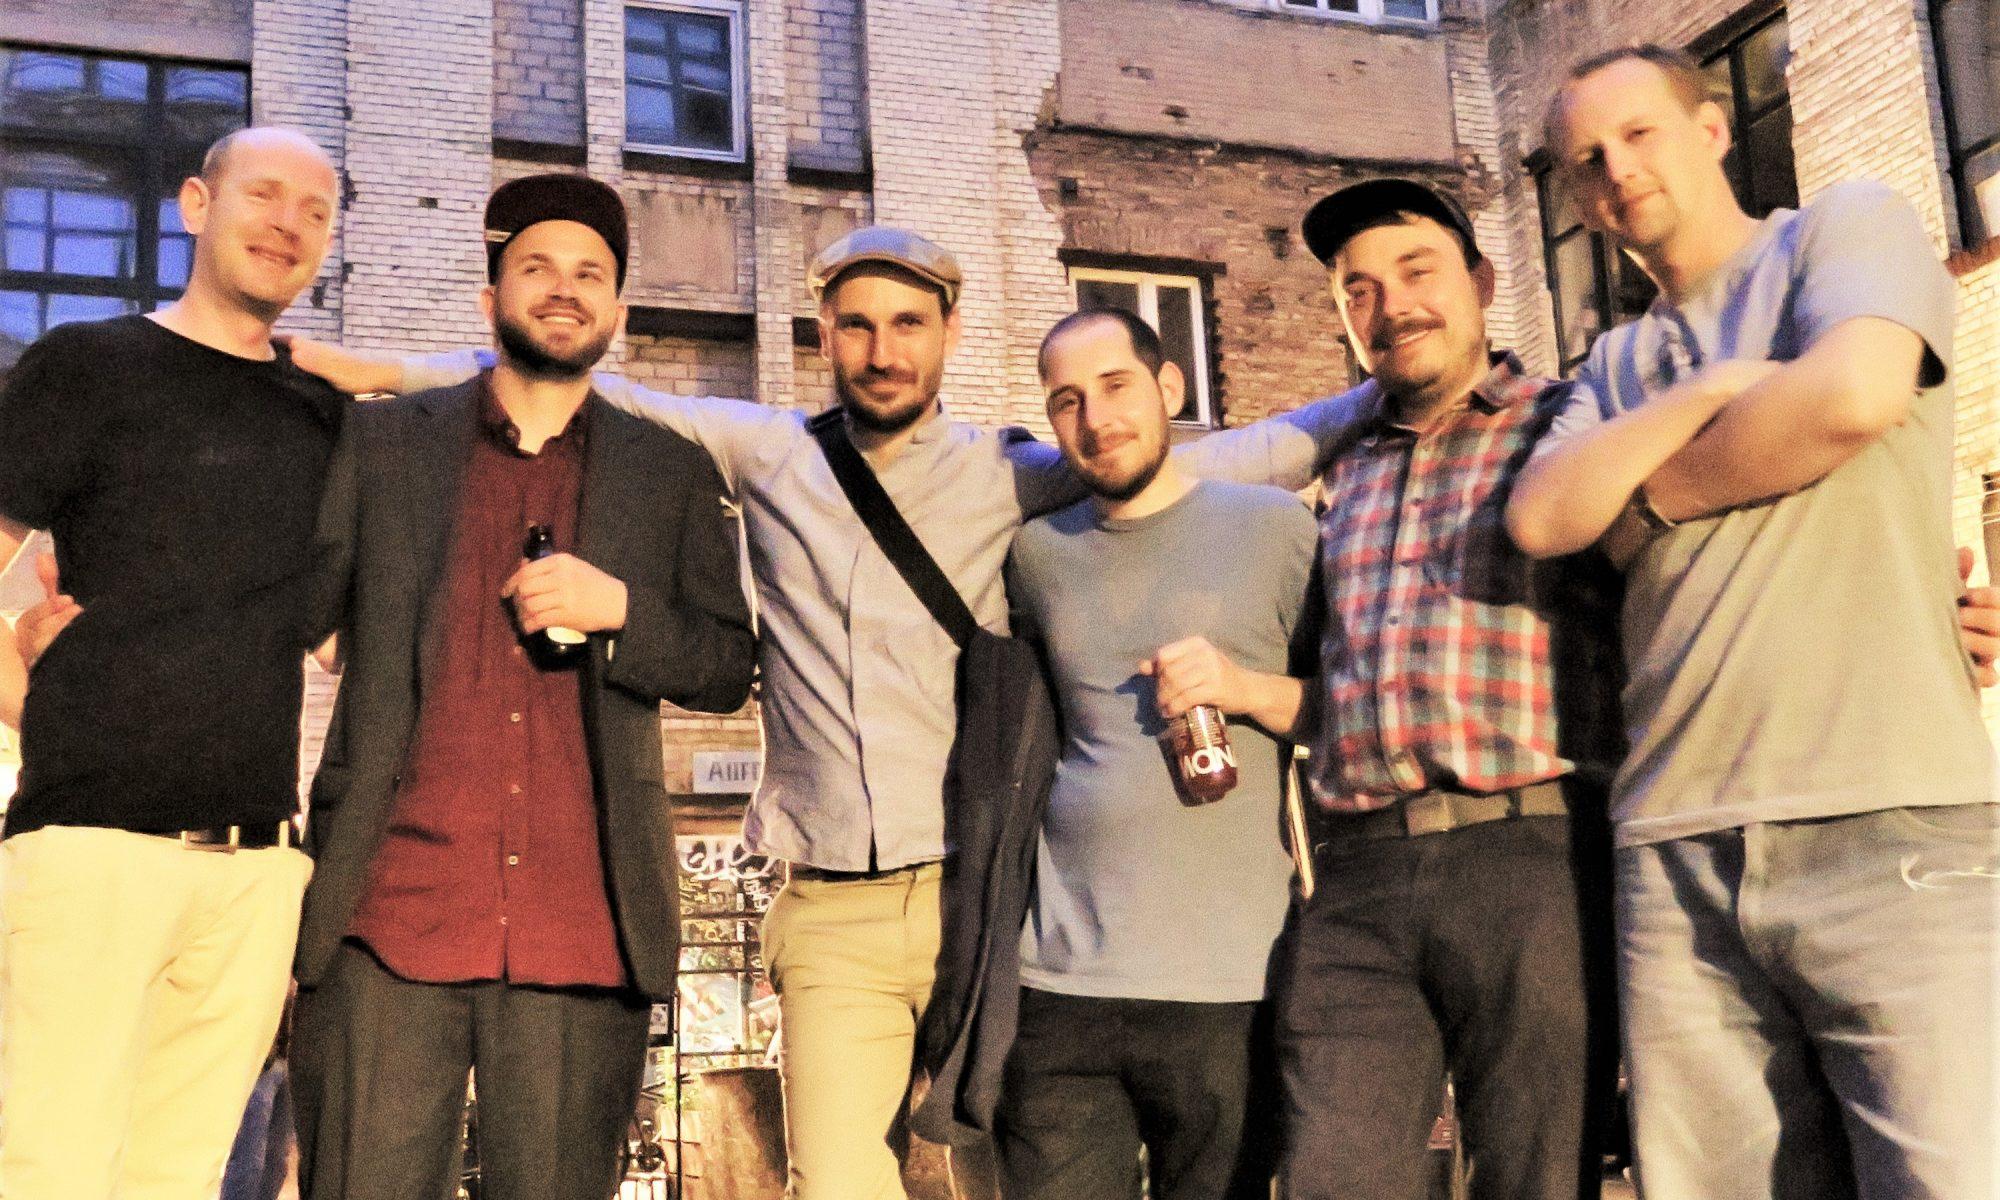 Beat Kollektiv: Markus Tone, Lucky Loop, Soulix, Marian Tone, Miko, Selfmade